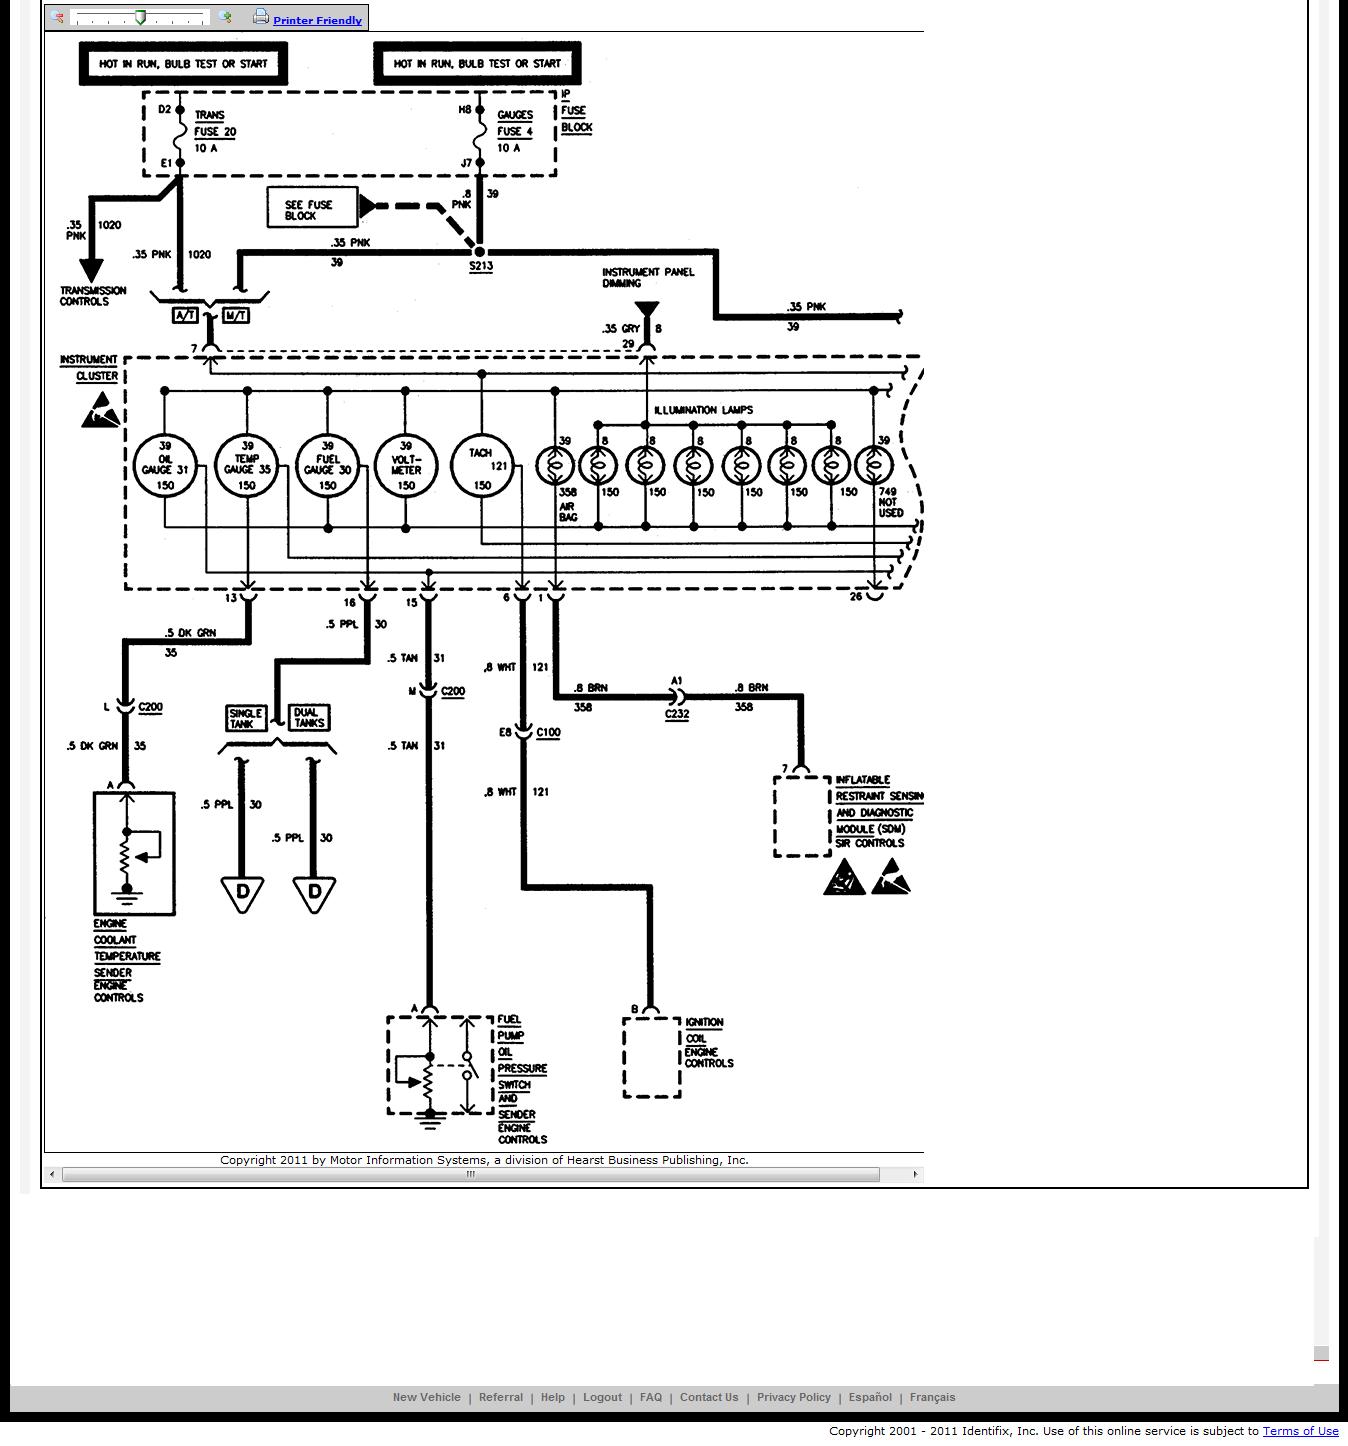 HX_1593] Chevyfuelpumpdiagrams Chevy Truck Fuel Pump Wiring Http Www Wiring  DiagramXortanet Emba Mohammedshrine Librar Wiring 101